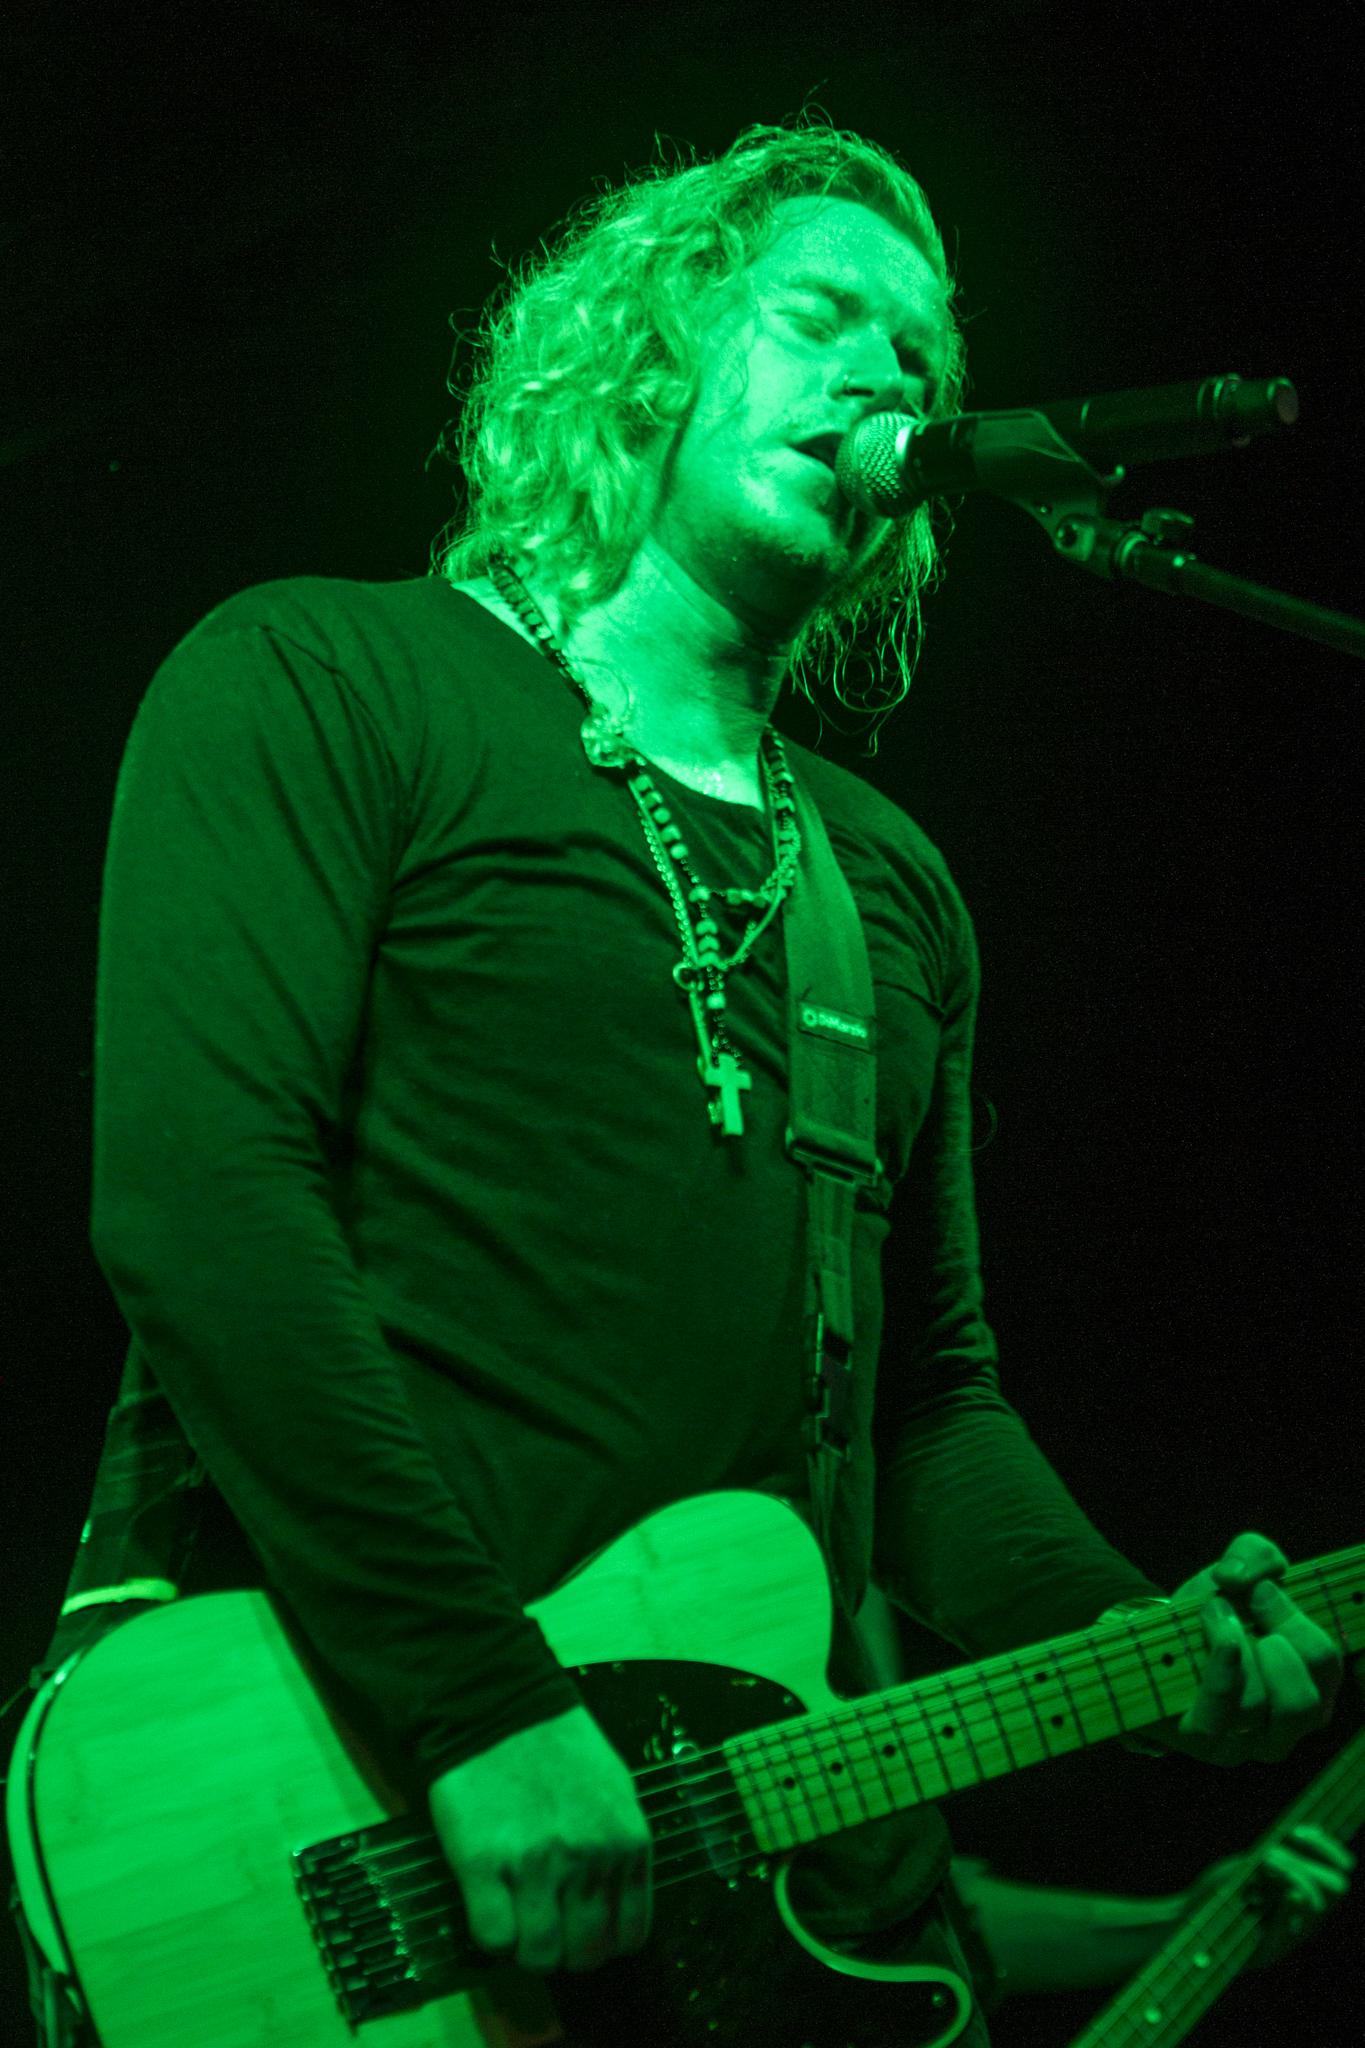 www.rtjphoto.com